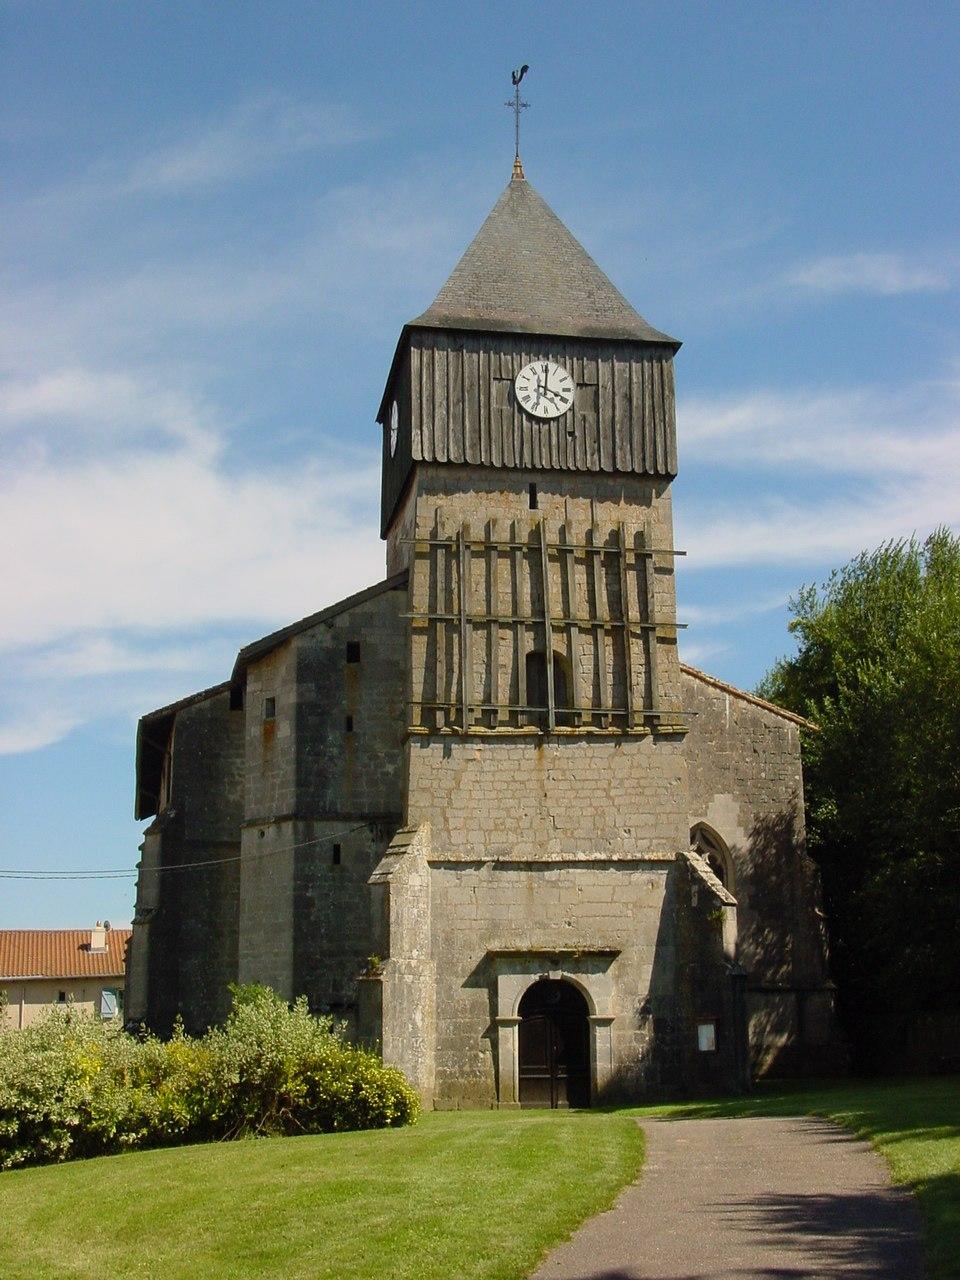 Eglise de Gironville (Meuse, France)